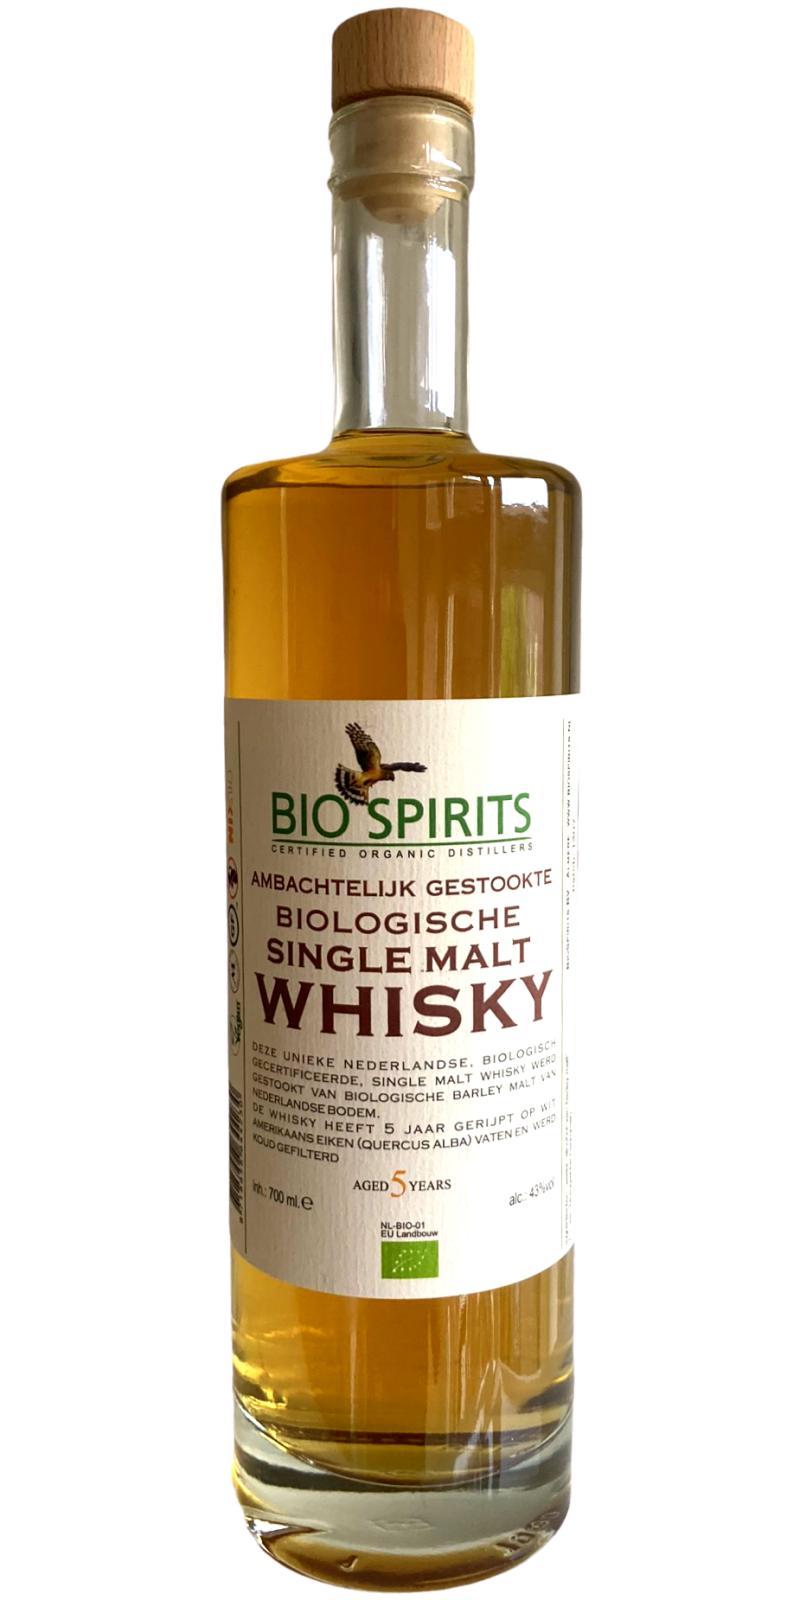 Single Malt Whisky 05-year-old